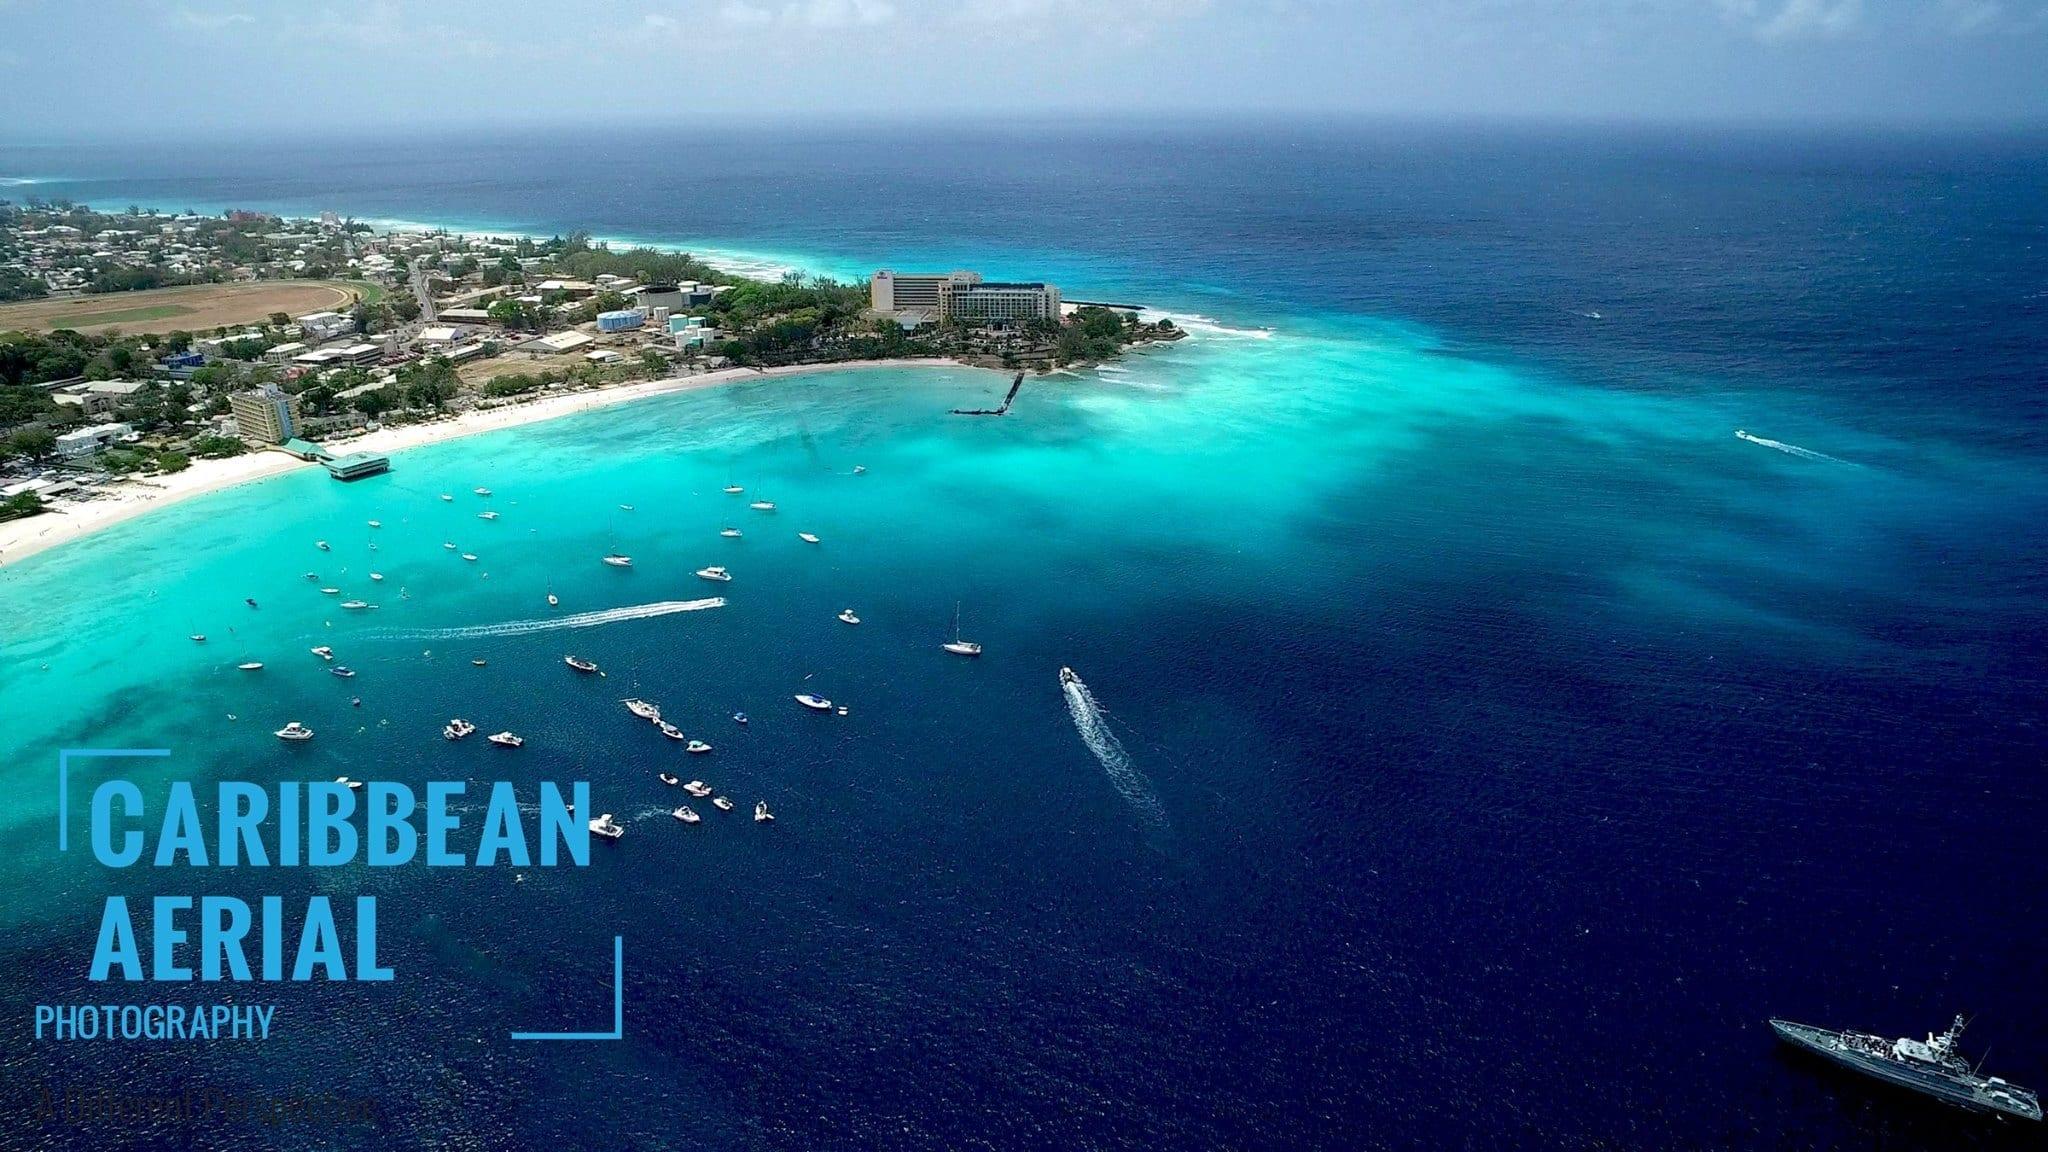 caribbean-aerial-photography-016